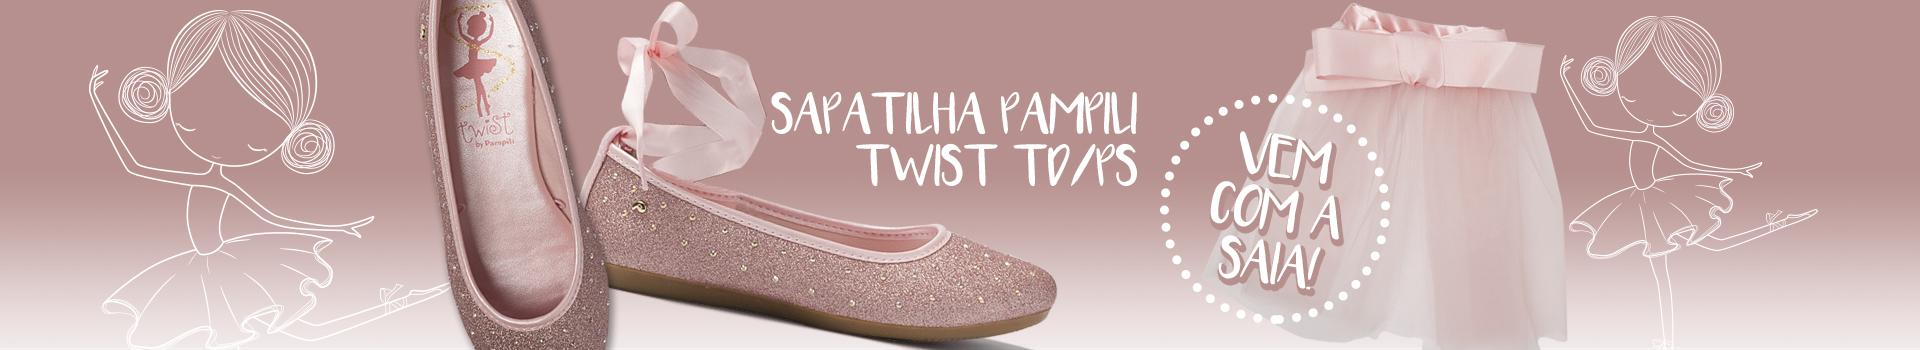 tvdesk_p3-09_11_18-Pampili_Twist